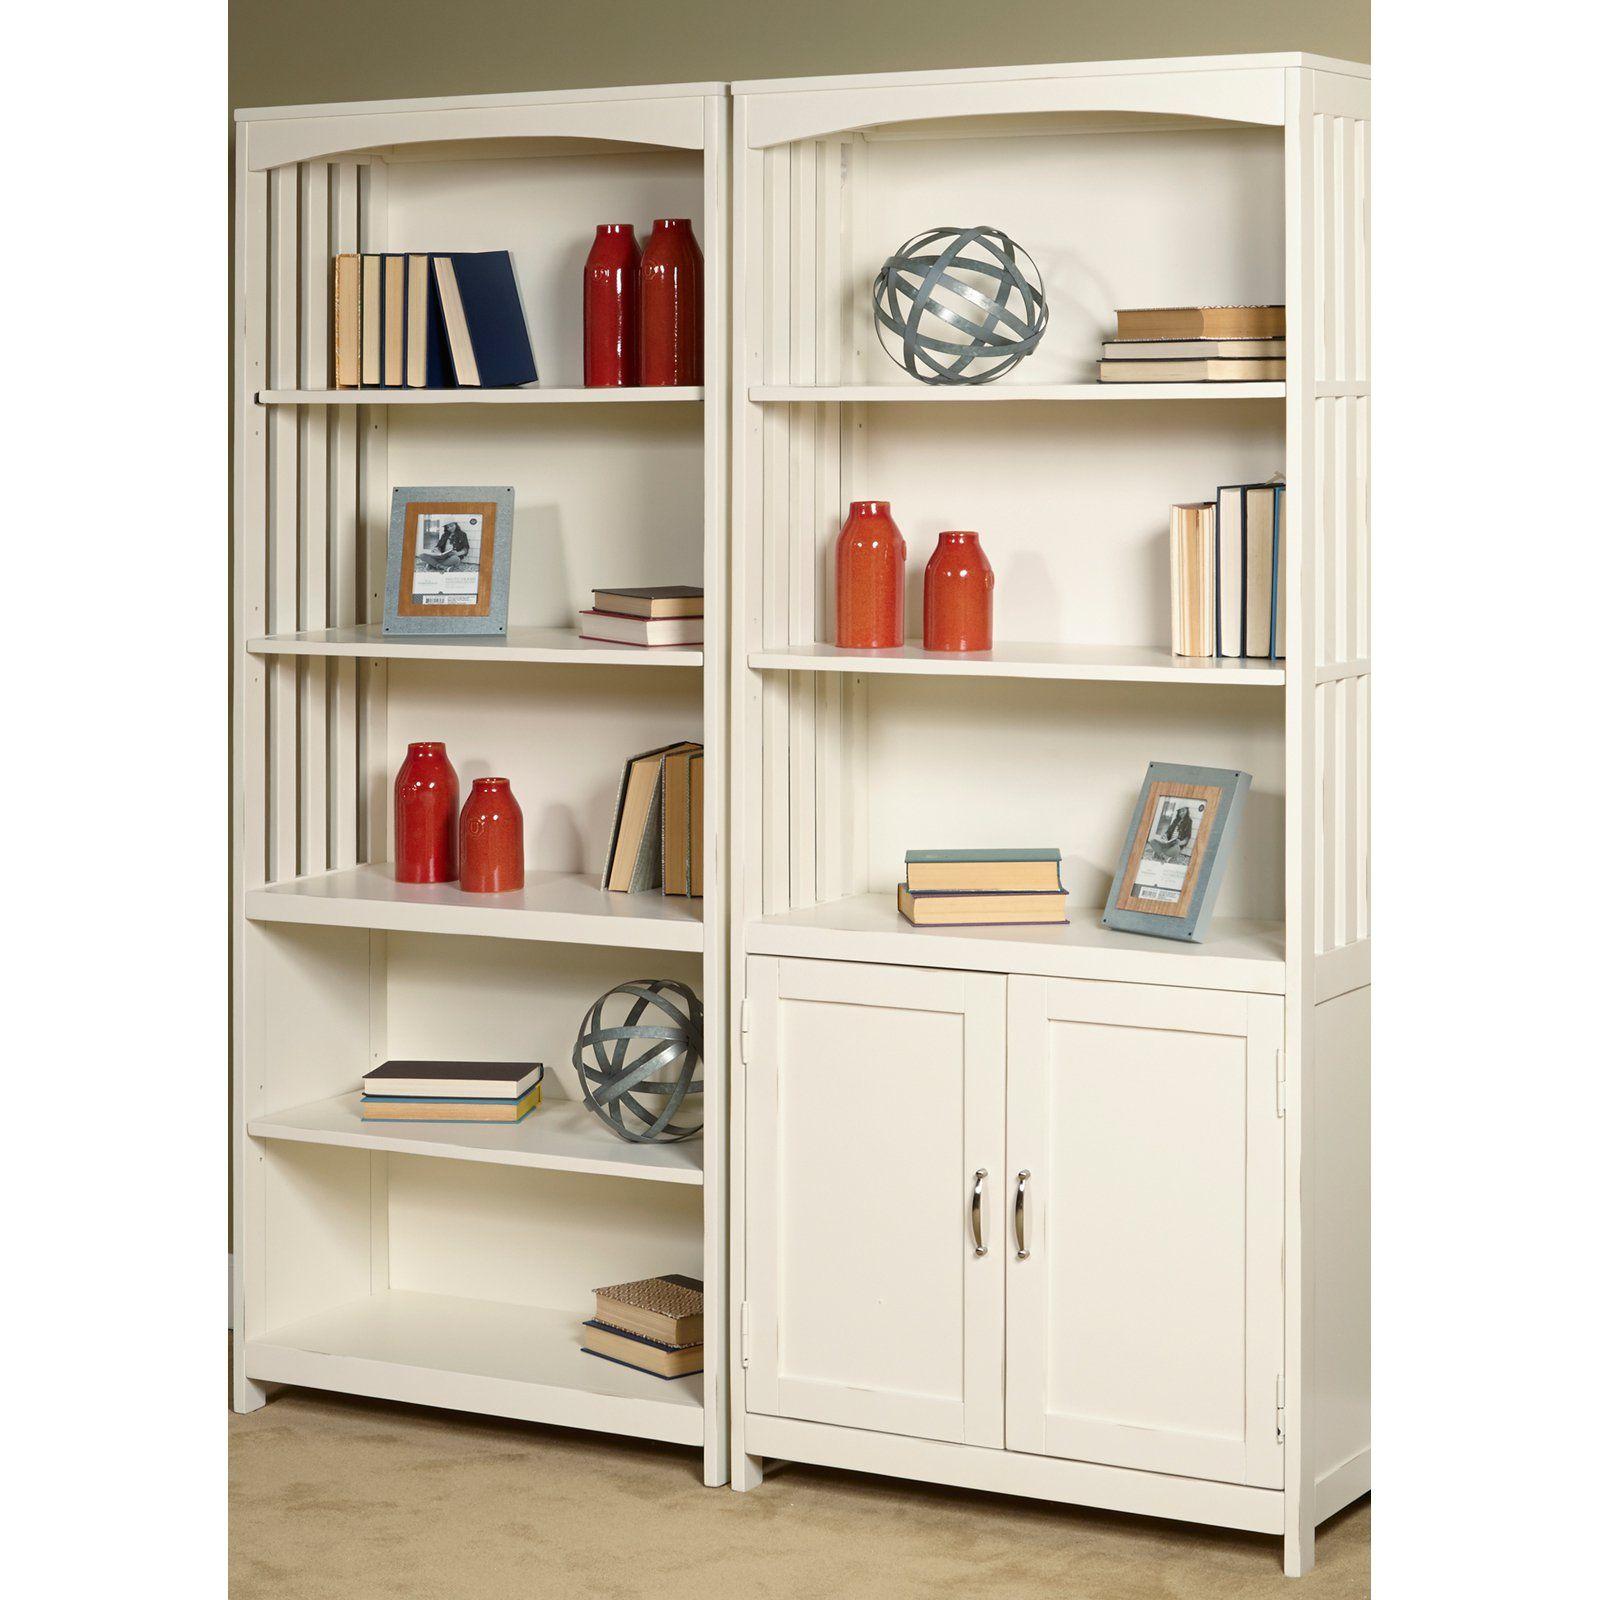 Liberty Furniture Hampton Bay Bookcase from hayneedle